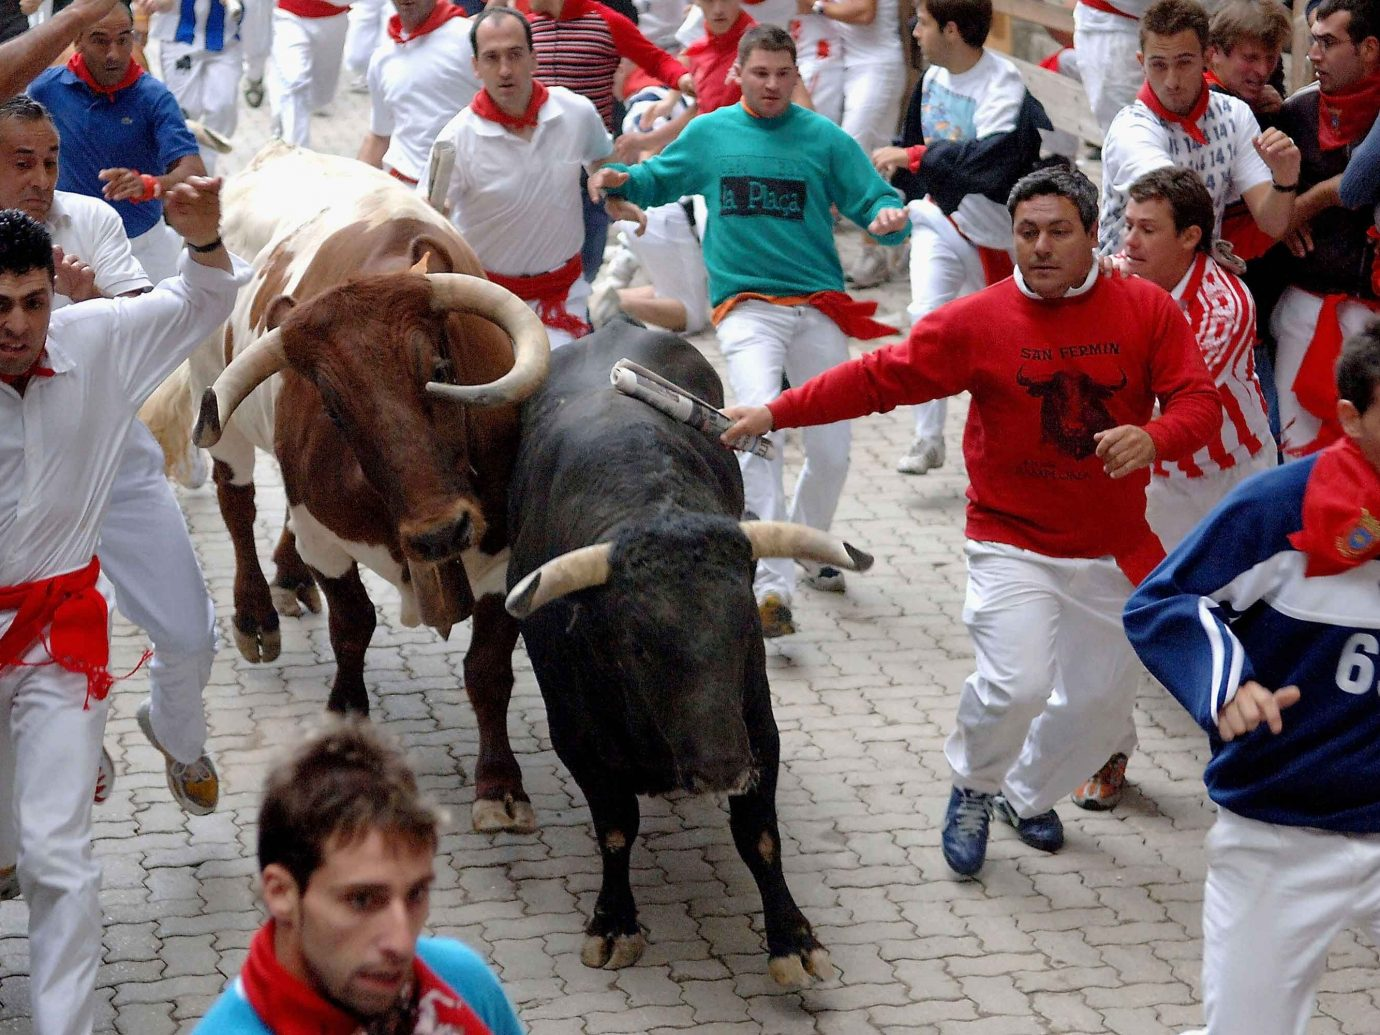 Offbeat person ground bull sports bullfighting cattle like mammal animal sports mammal equestrian sport tradition jockey rodeo festival bovine crowd